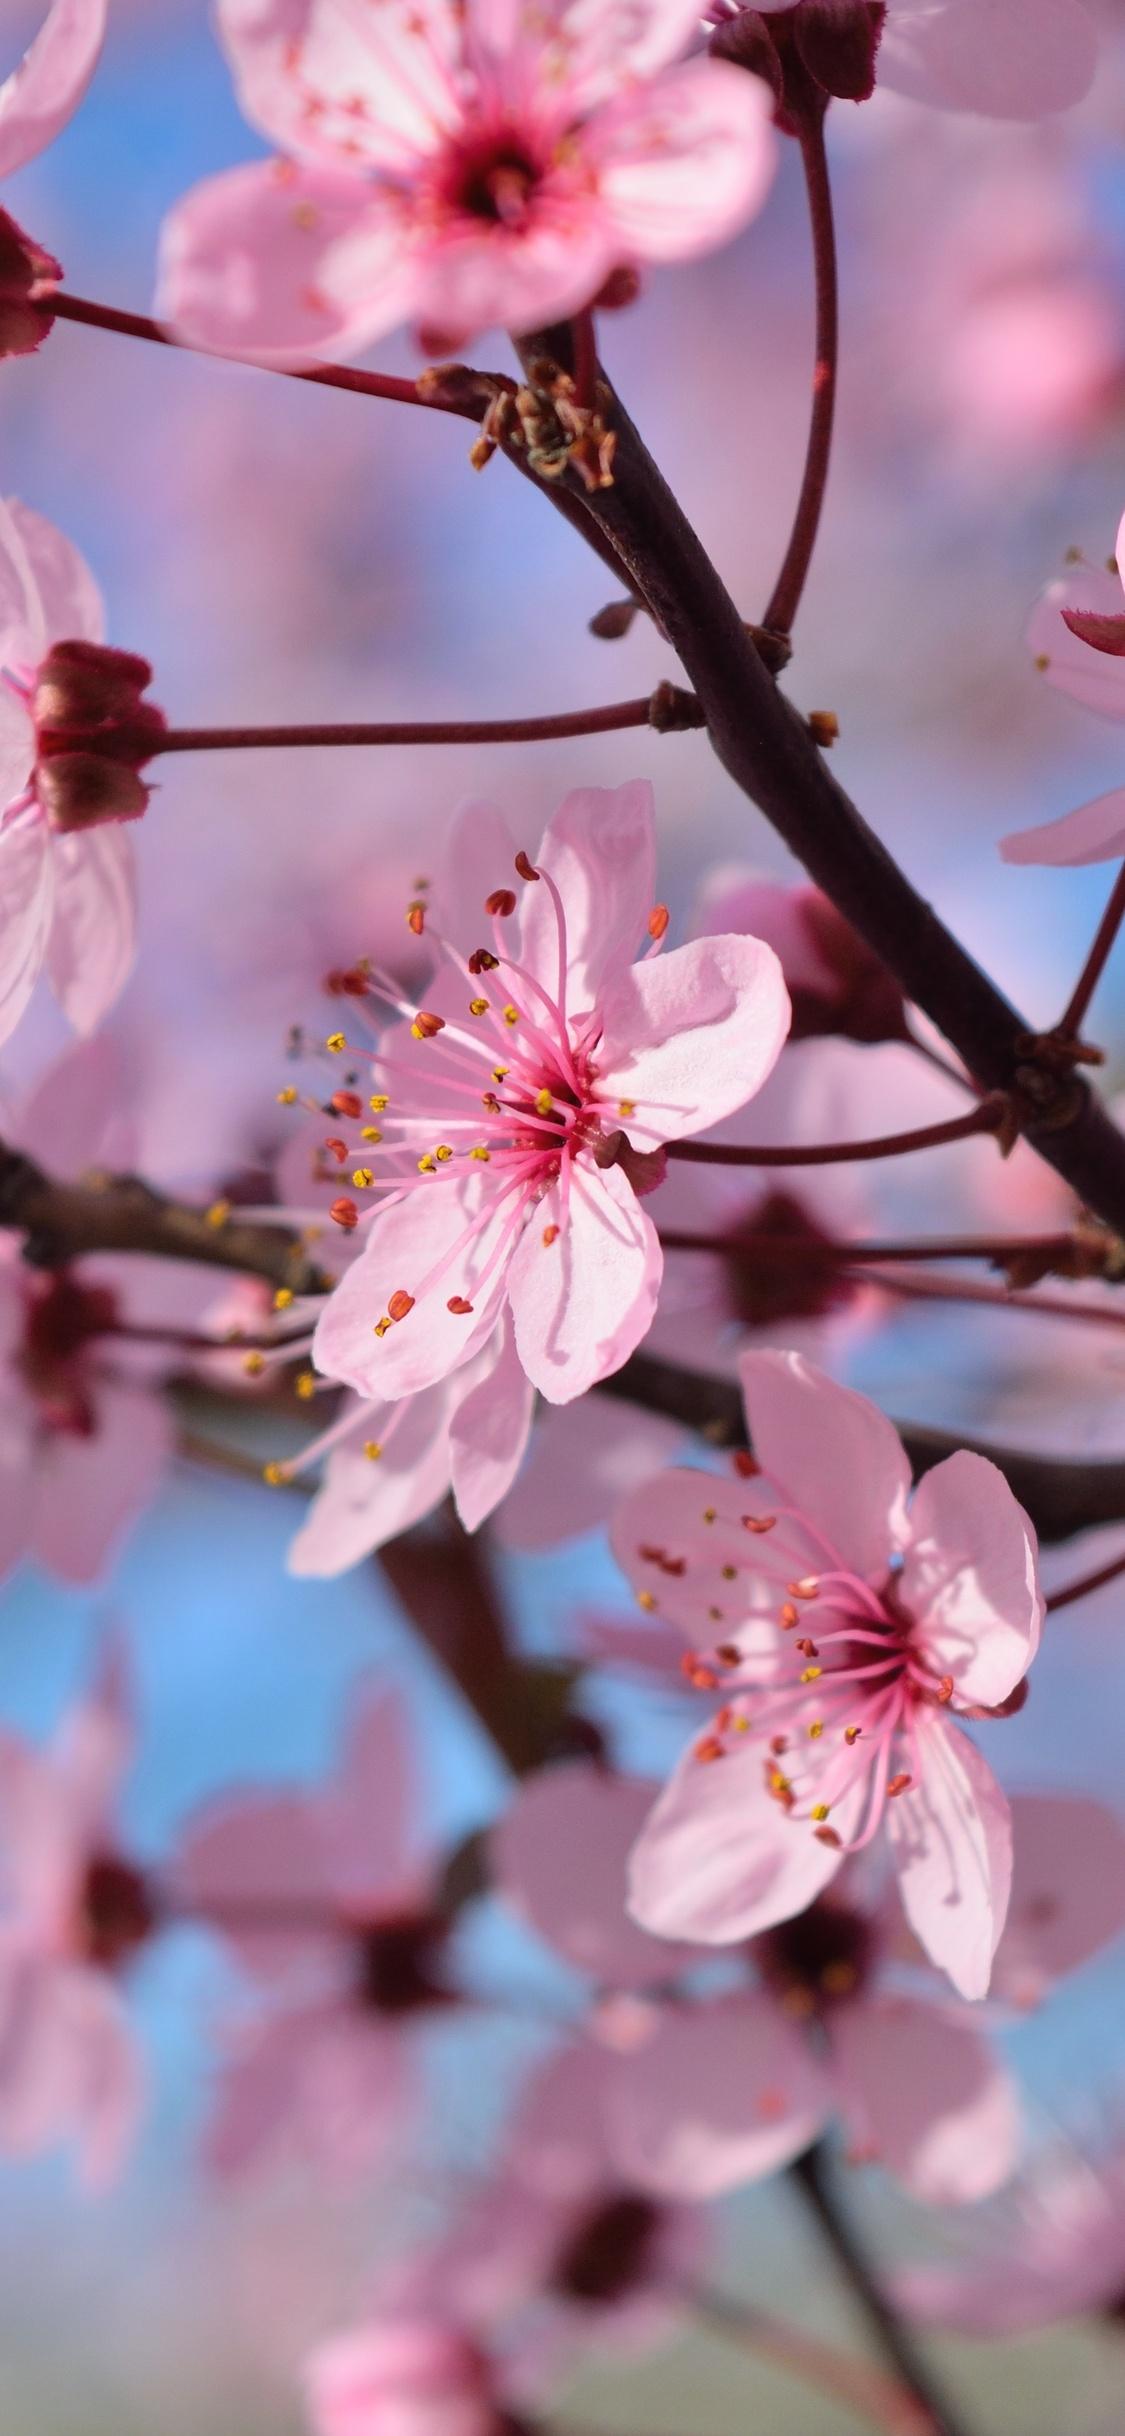 1125x2436 Spring Season Flowers Iphone XS,Iphone 10,Iphone ...